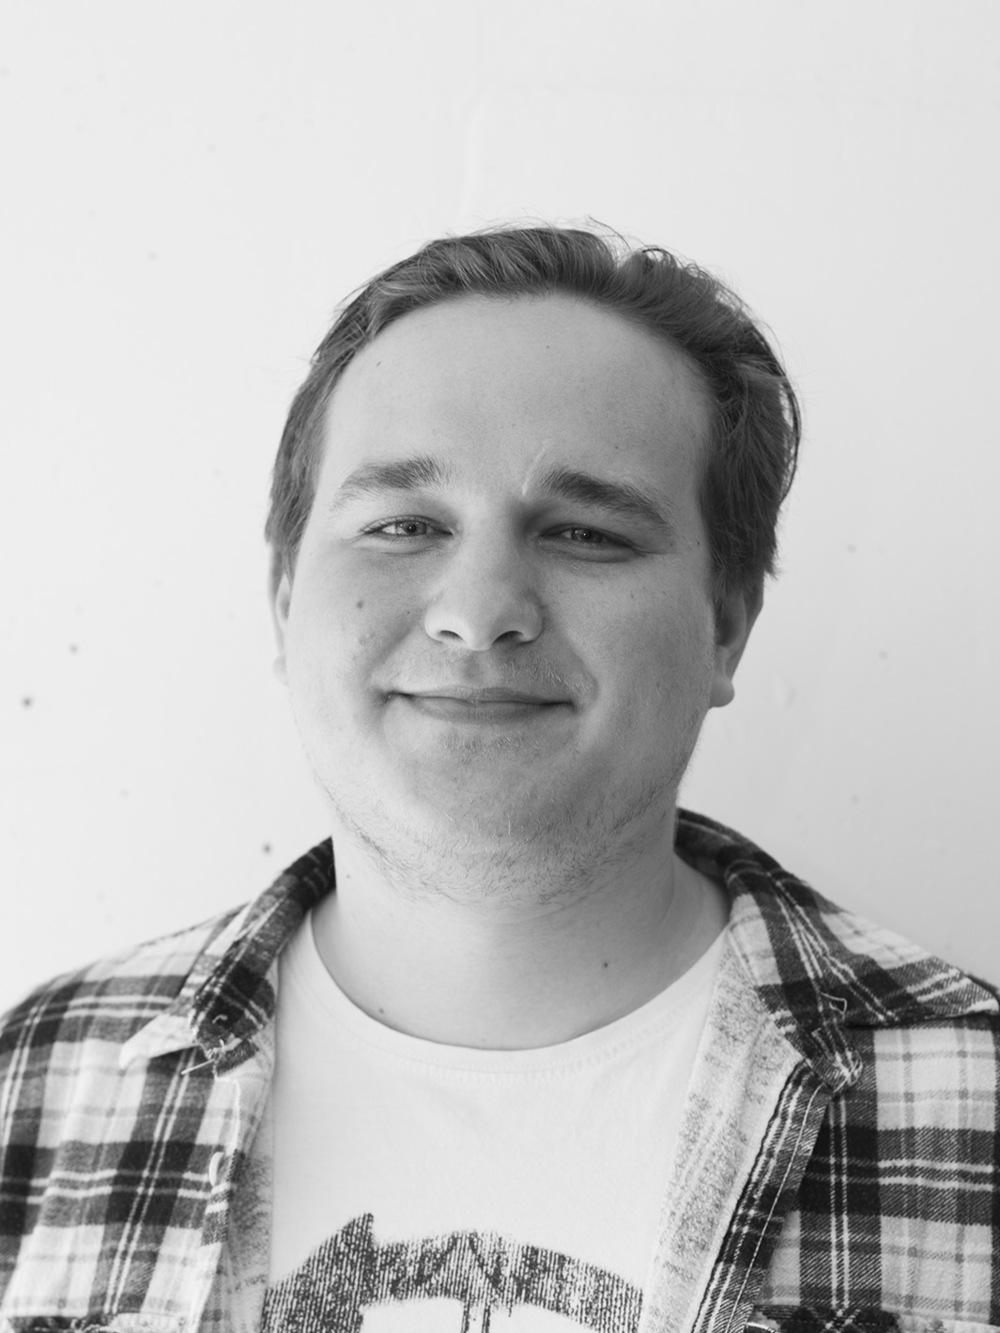 Patrick McGreevy - Producer